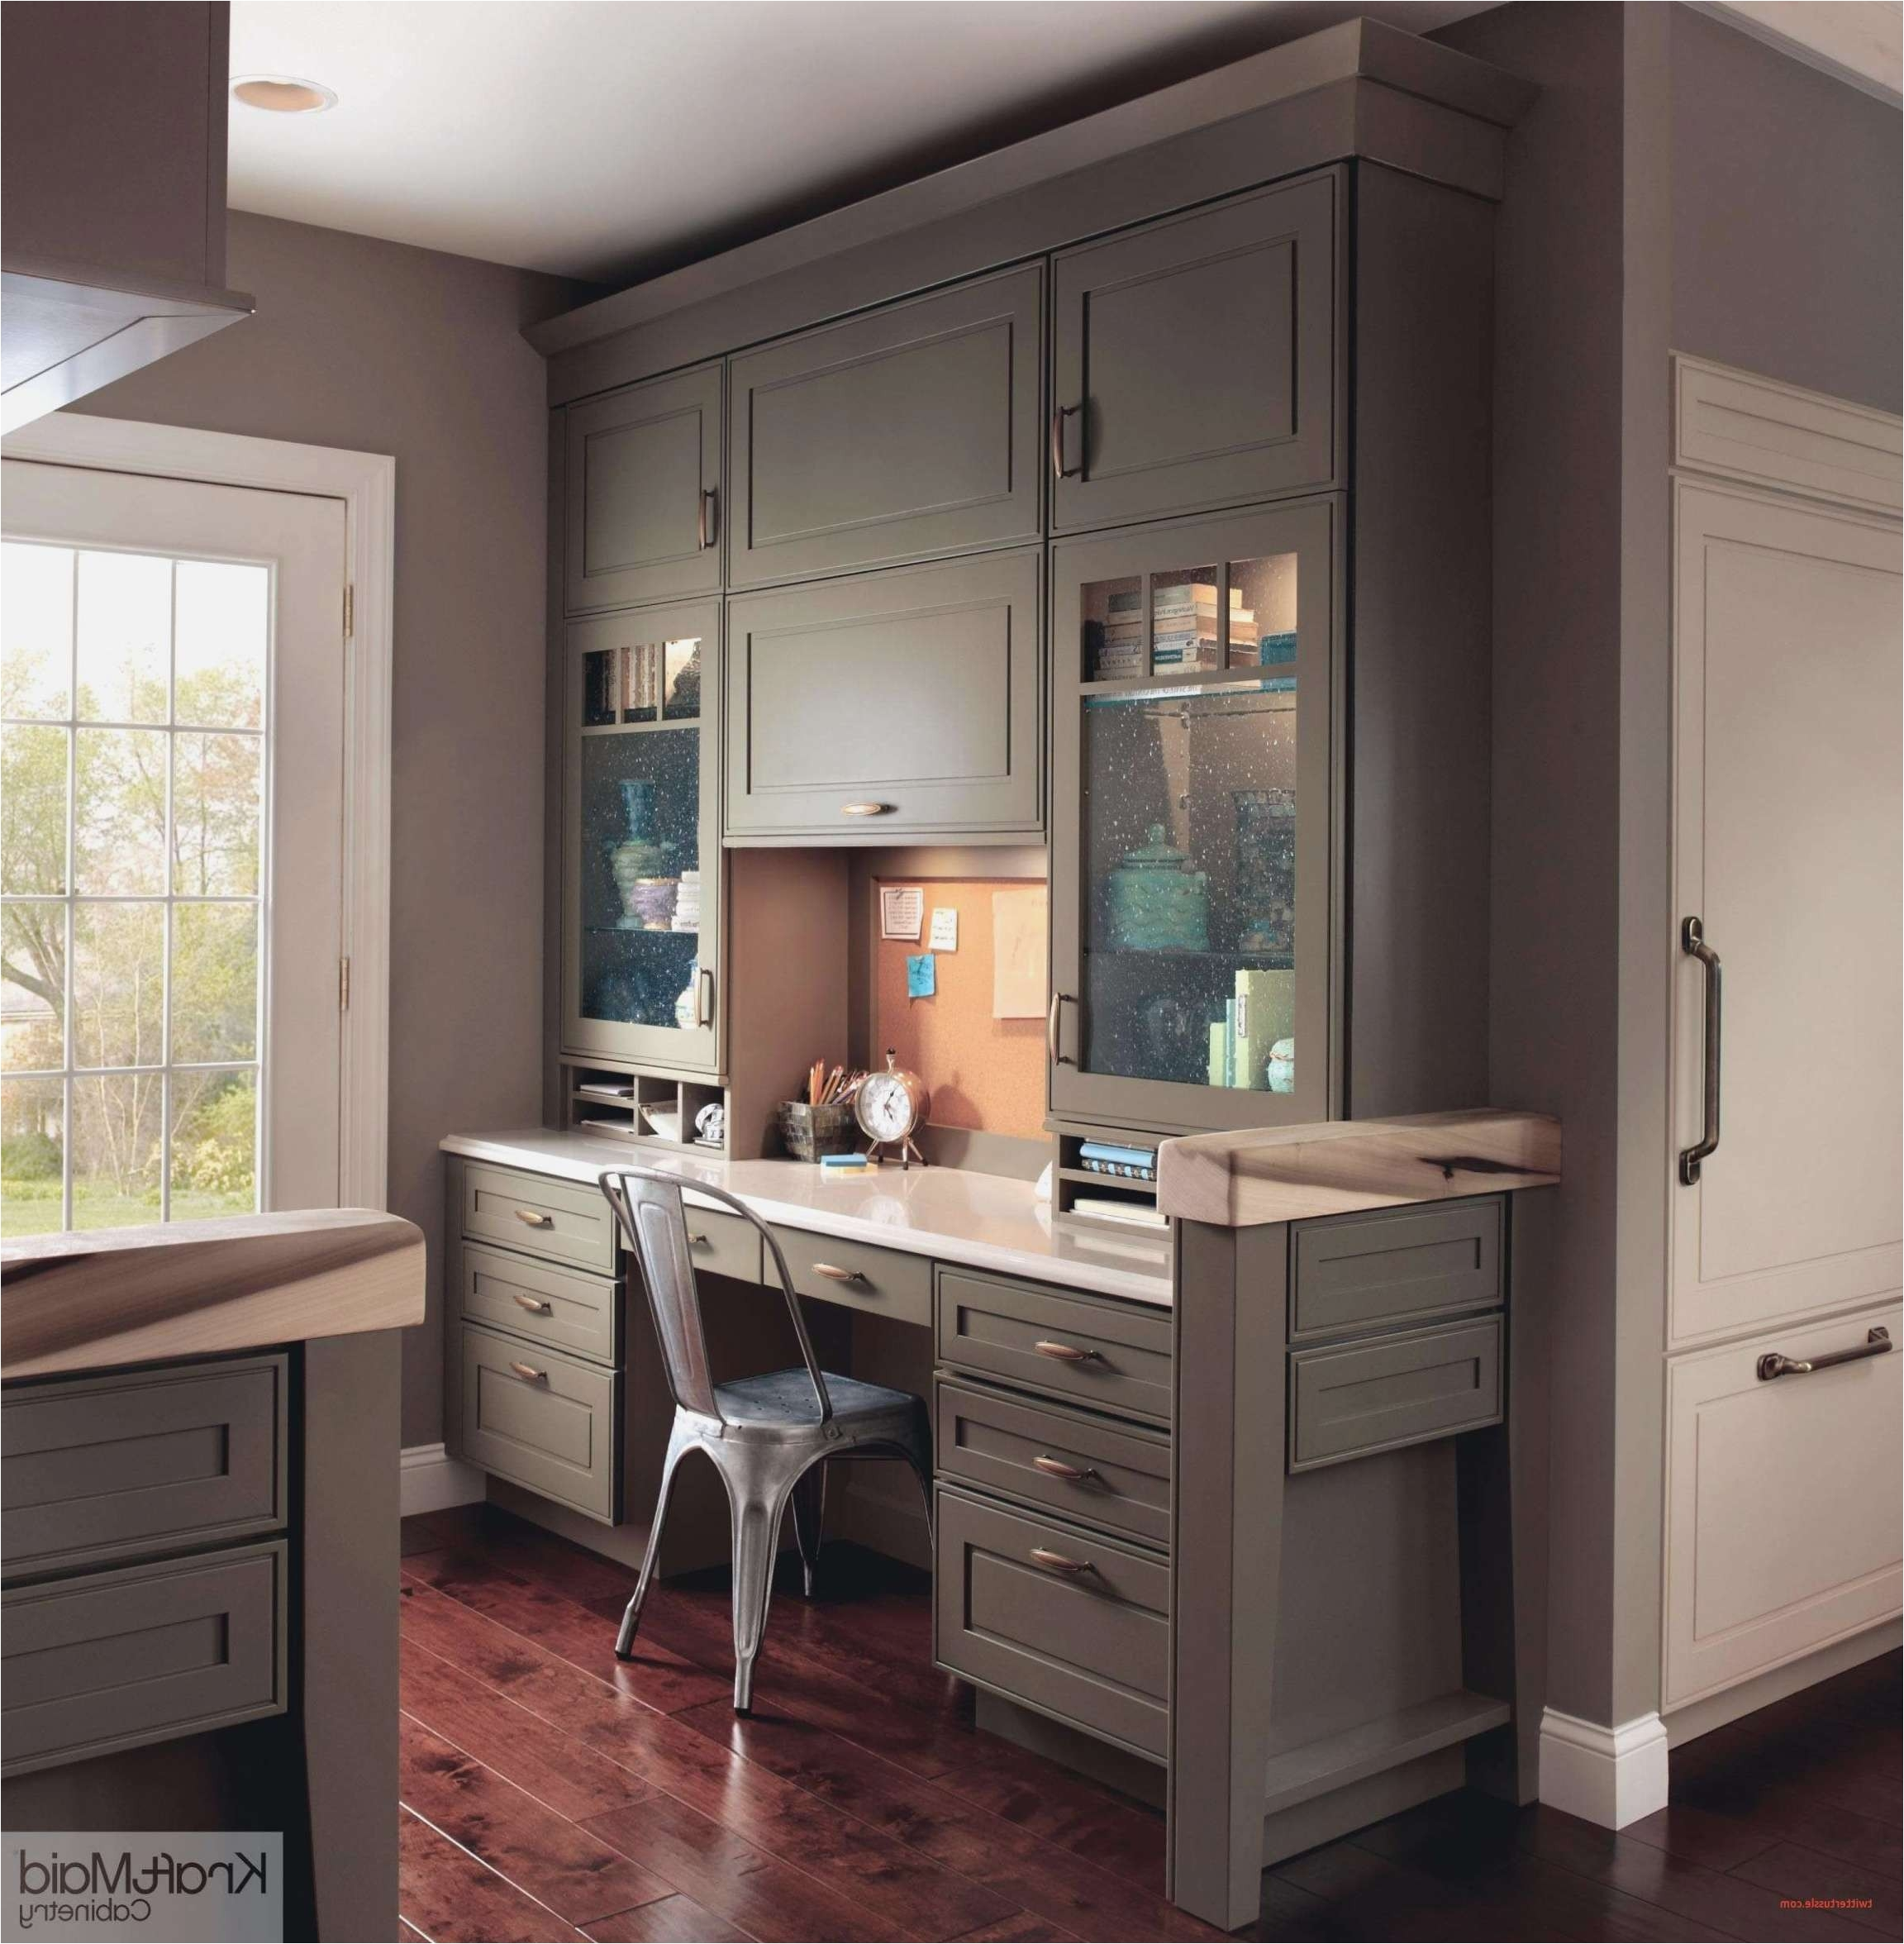 Pickled Maple Kitchen Cabinets Awesome Kitchen Cabinet 0d Kitchen Design Cheap Kitchen Countertop Ideas